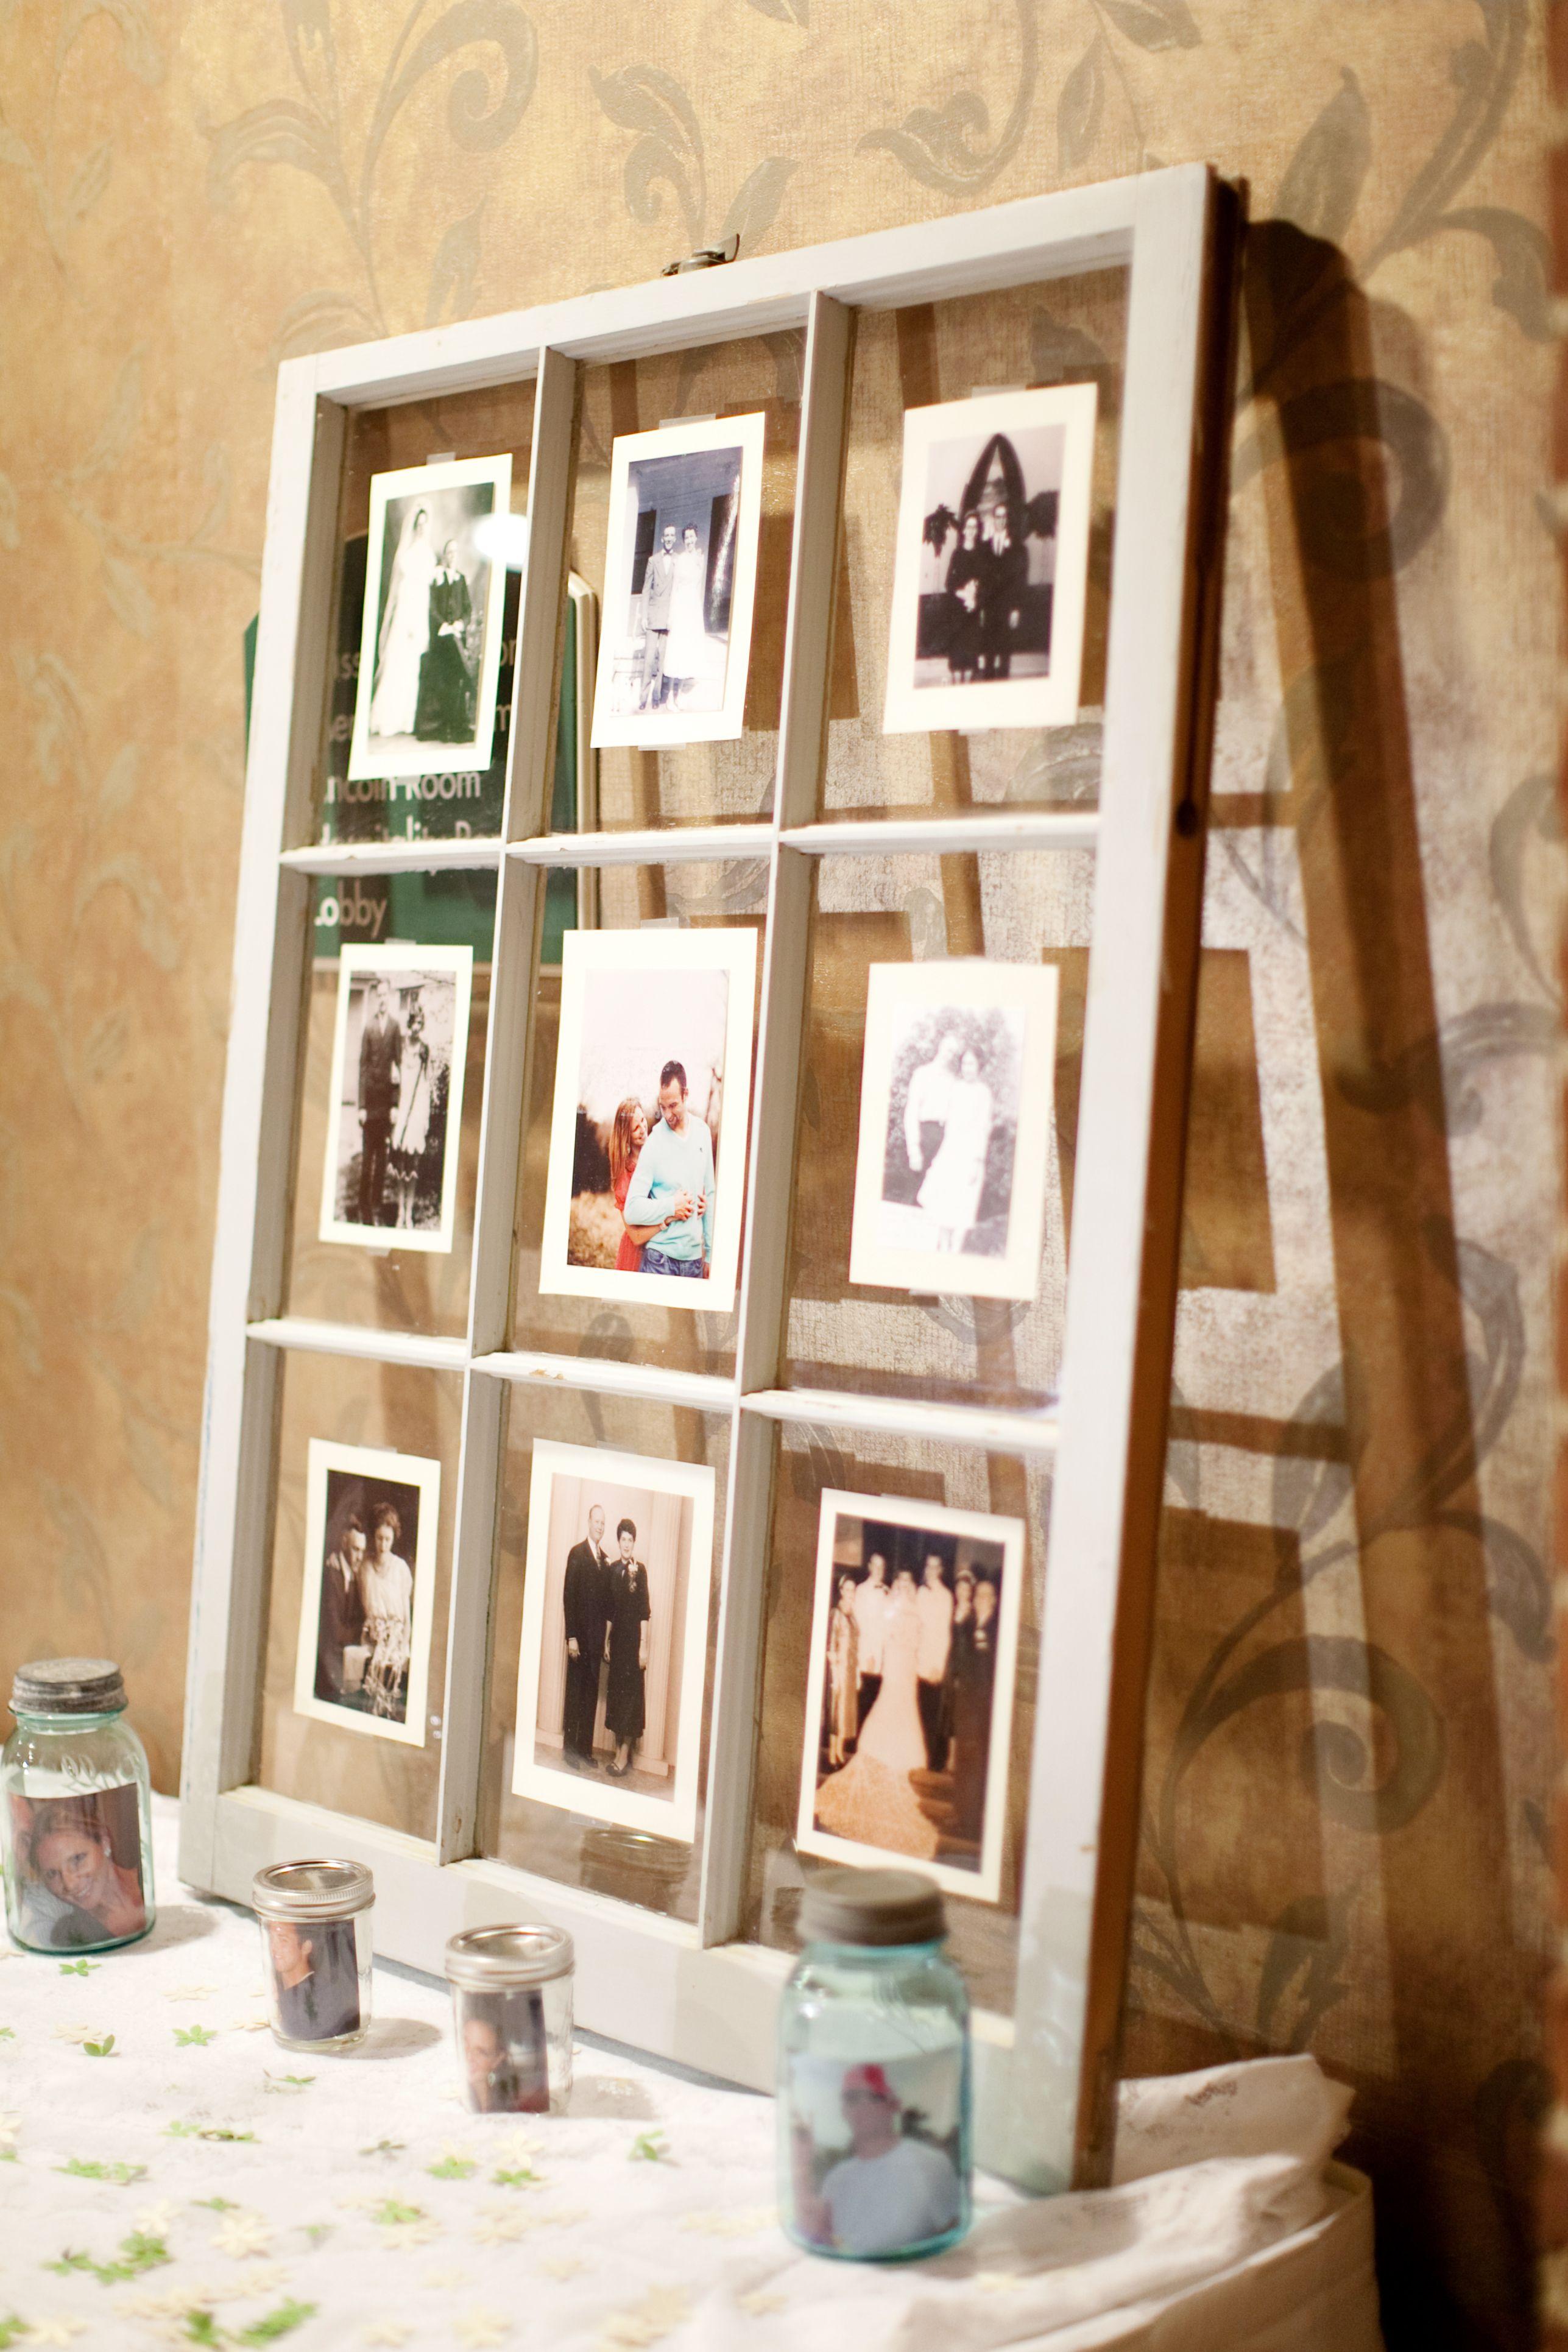 old window decor with grandparents wedding photos ...